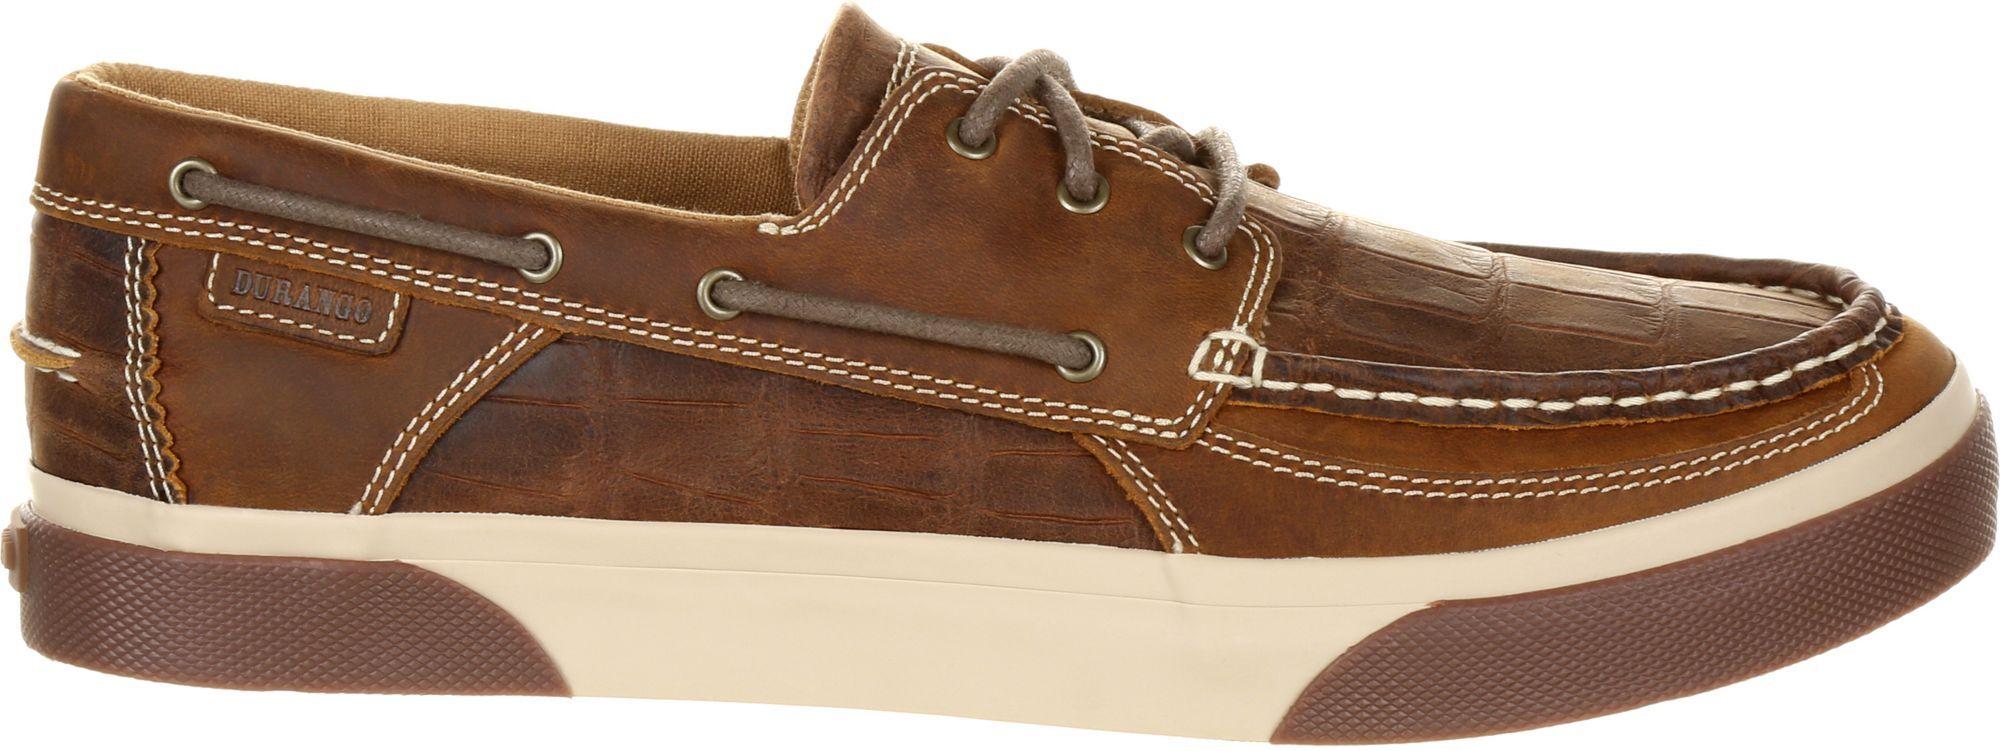 Durango Men's Music City Gator Western Boat Shoes, Brown